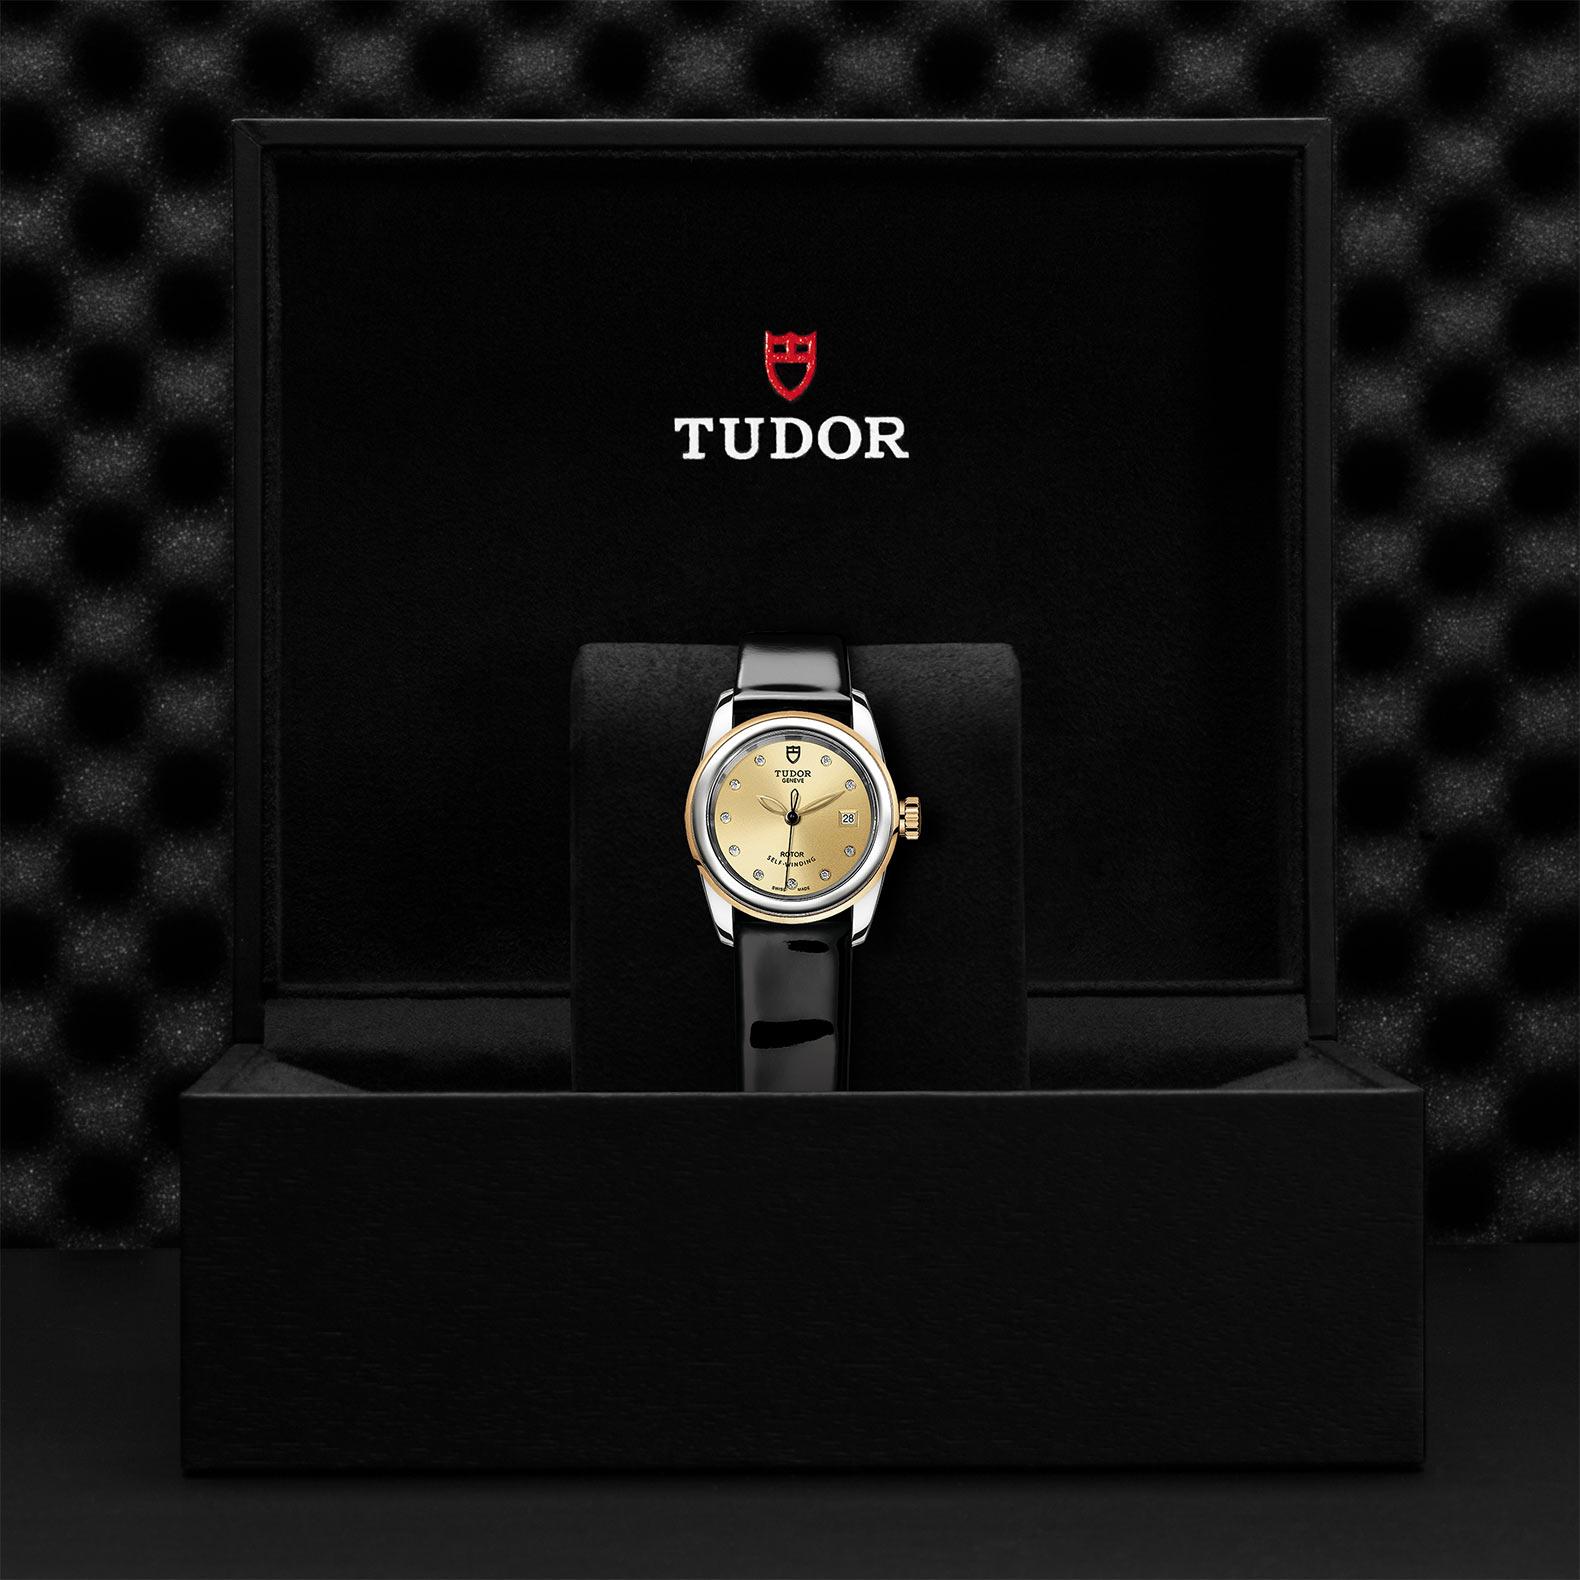 TUDOR Glamour Date M51003 0019 Presentation